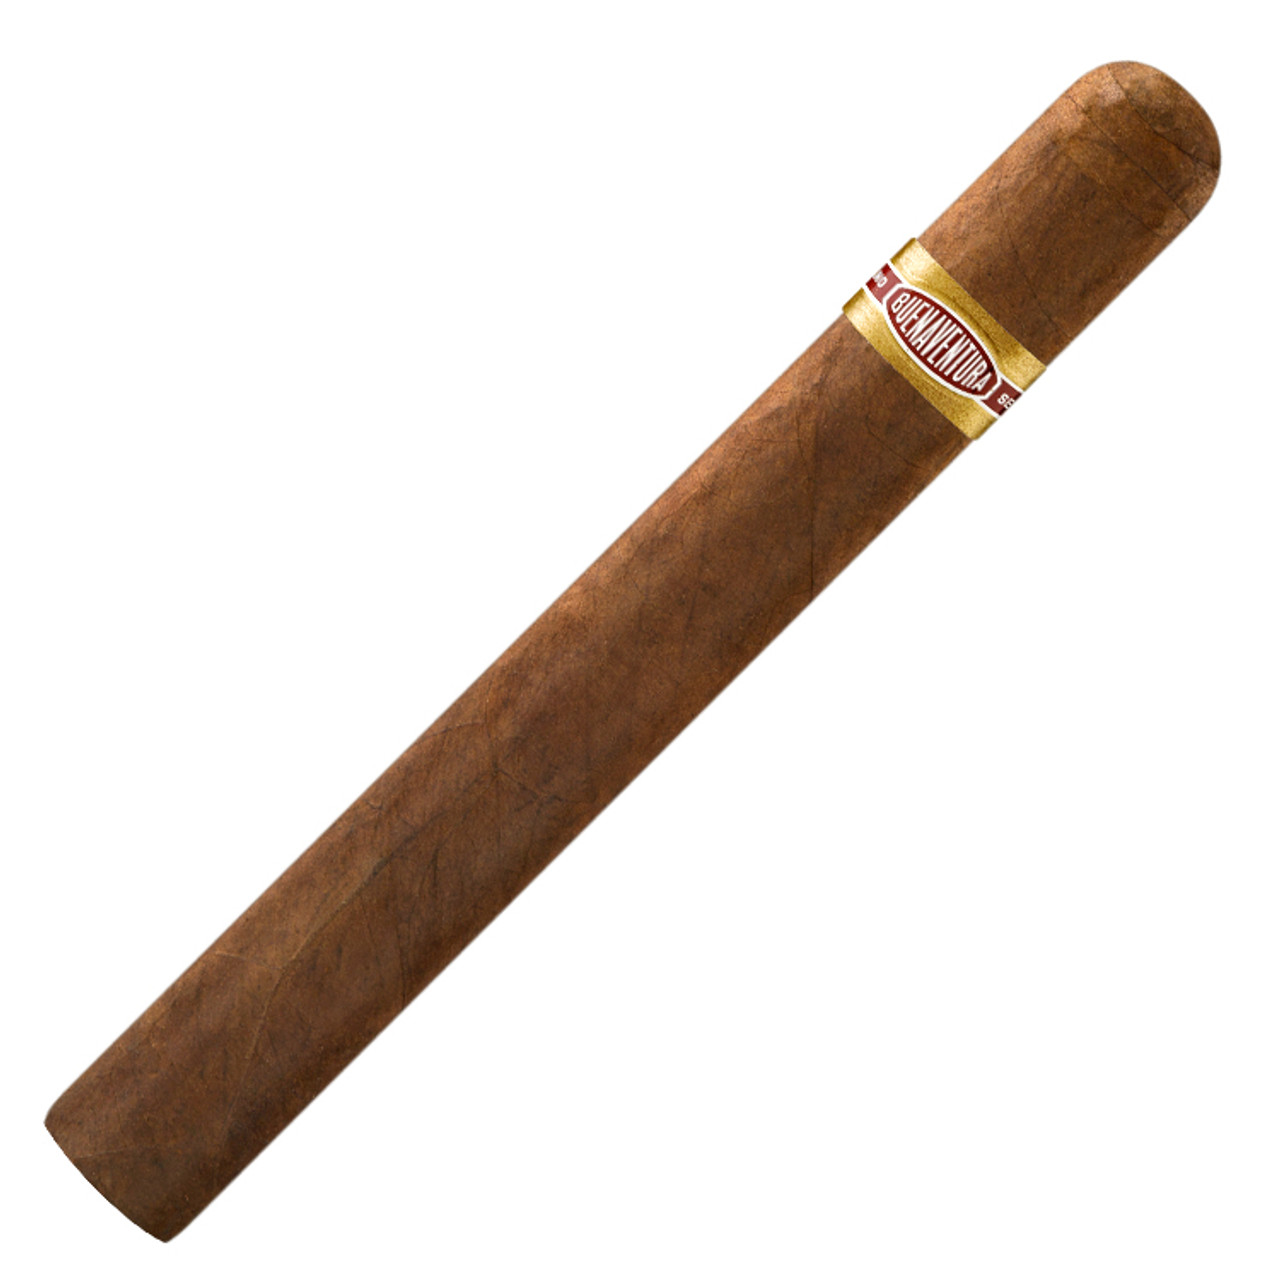 Curivari Buenaventura Pralines P652 Cigars - 6.75 x 52 (Box of 10)